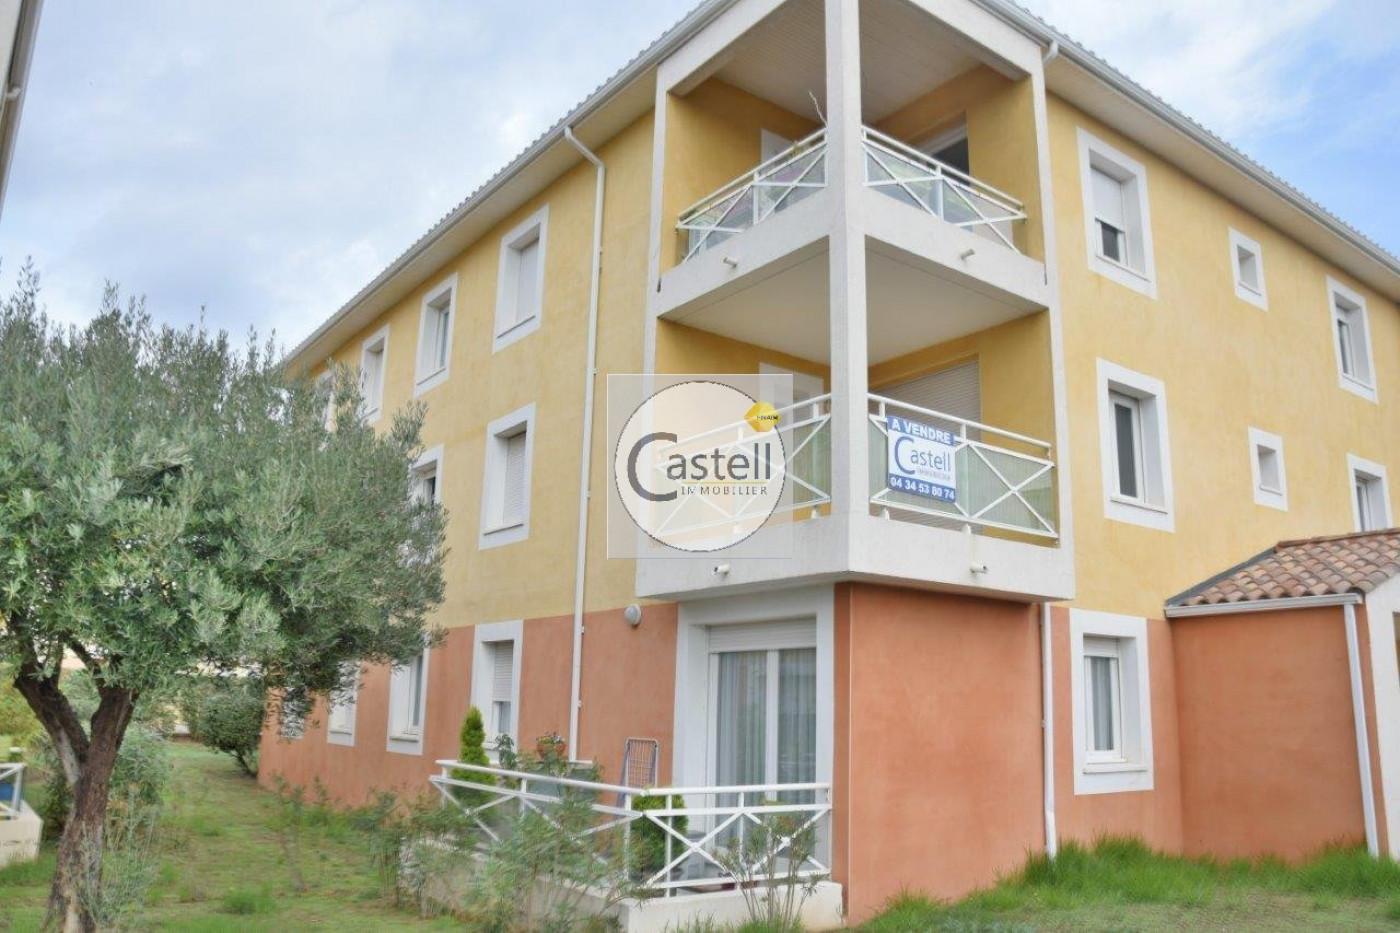 A vendre  Agde | Réf 343755502 - Castell immobilier